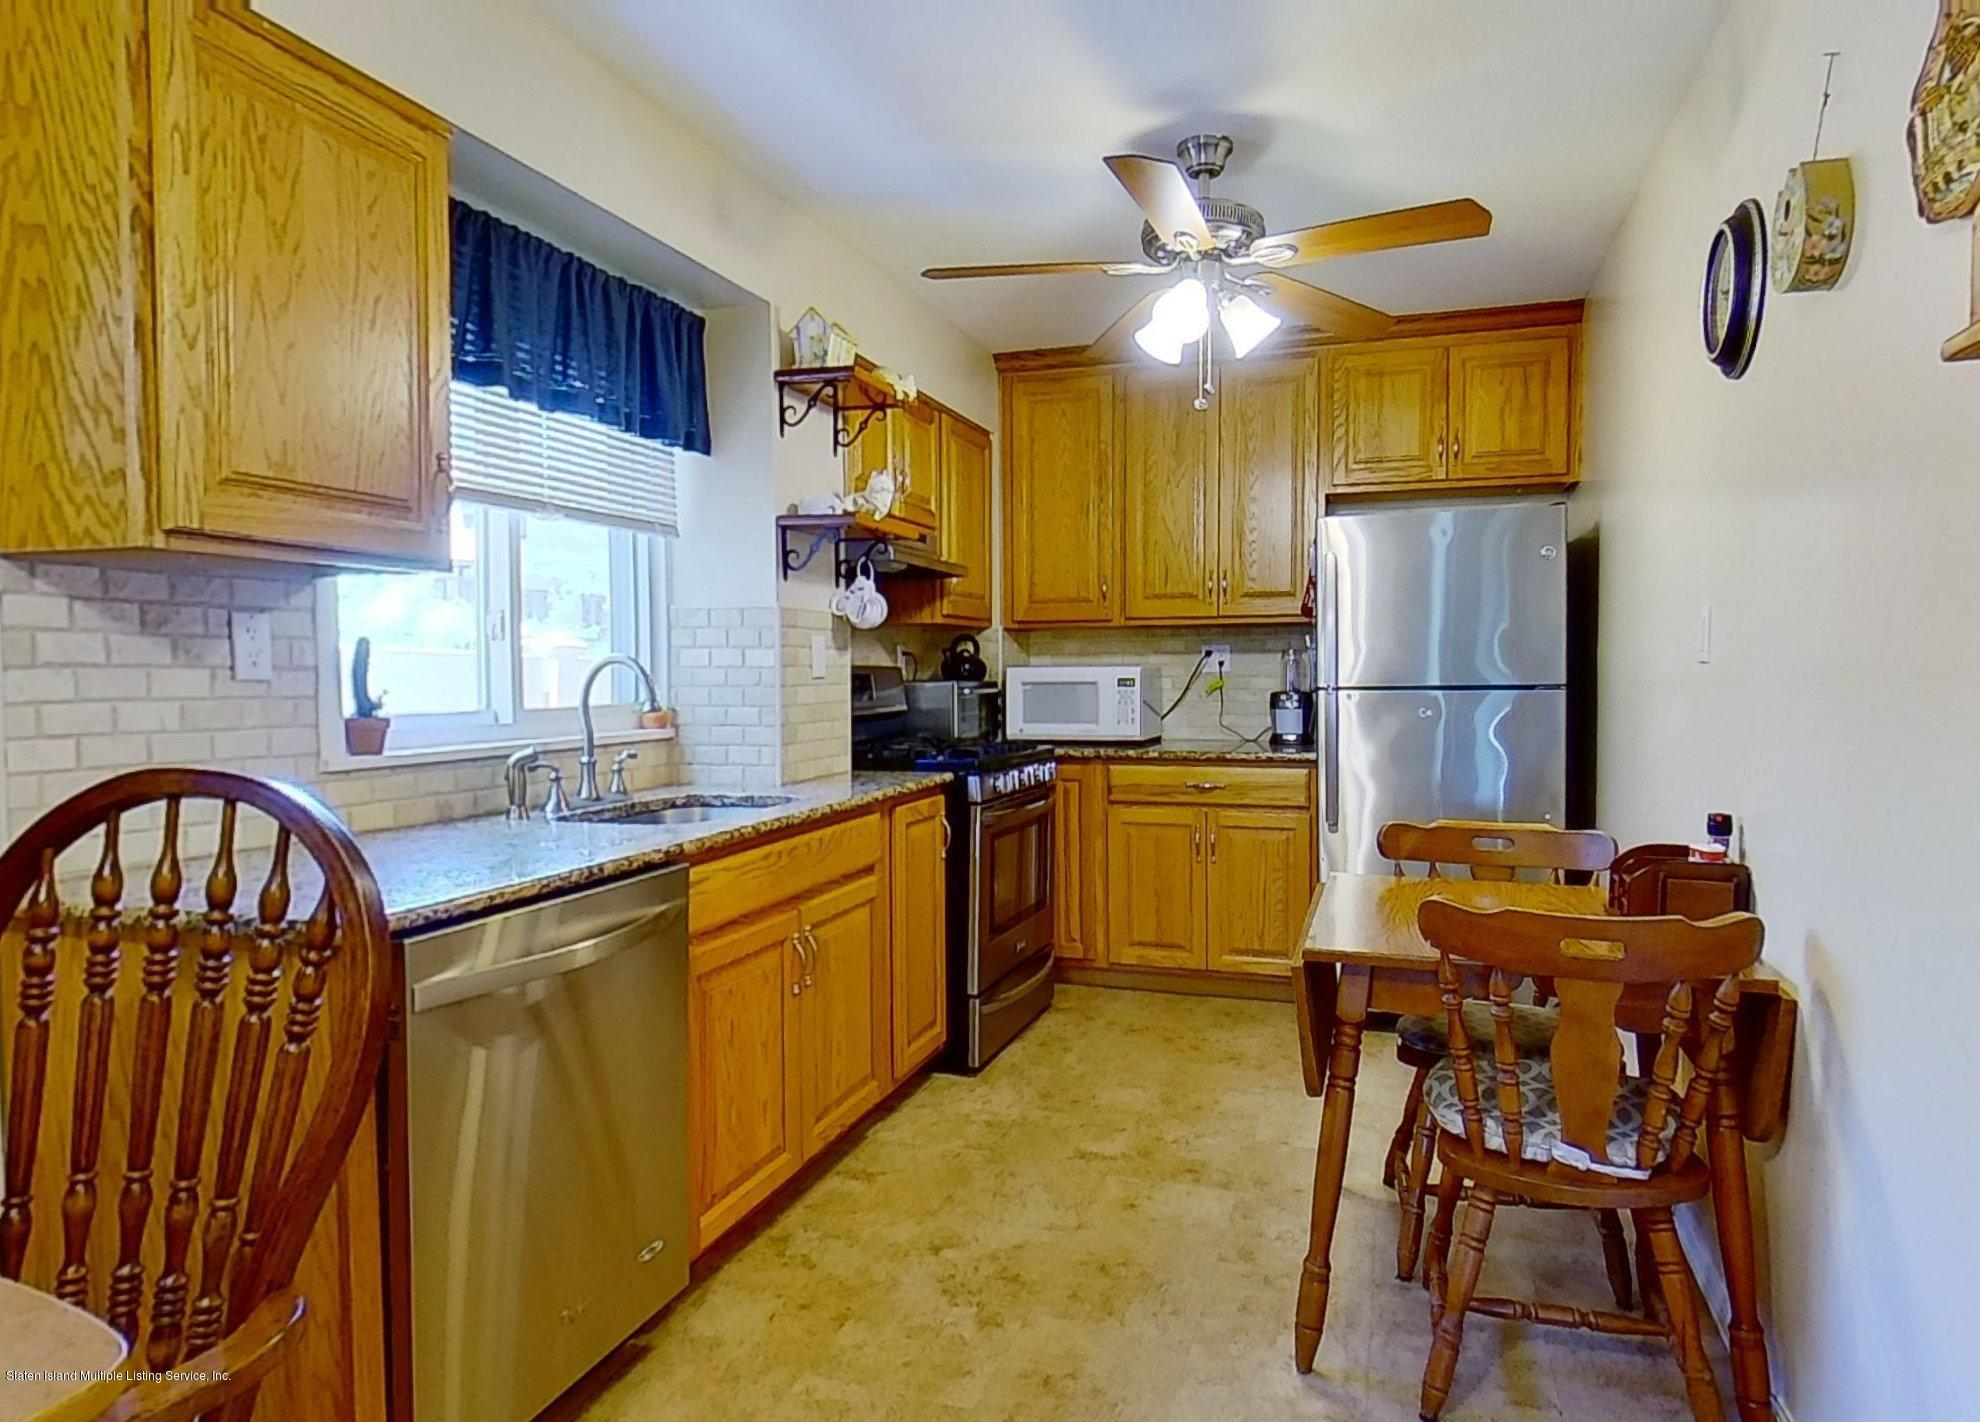 Single Family - Detached 355 King Street  Staten Island, NY 10312, MLS-1137224-4